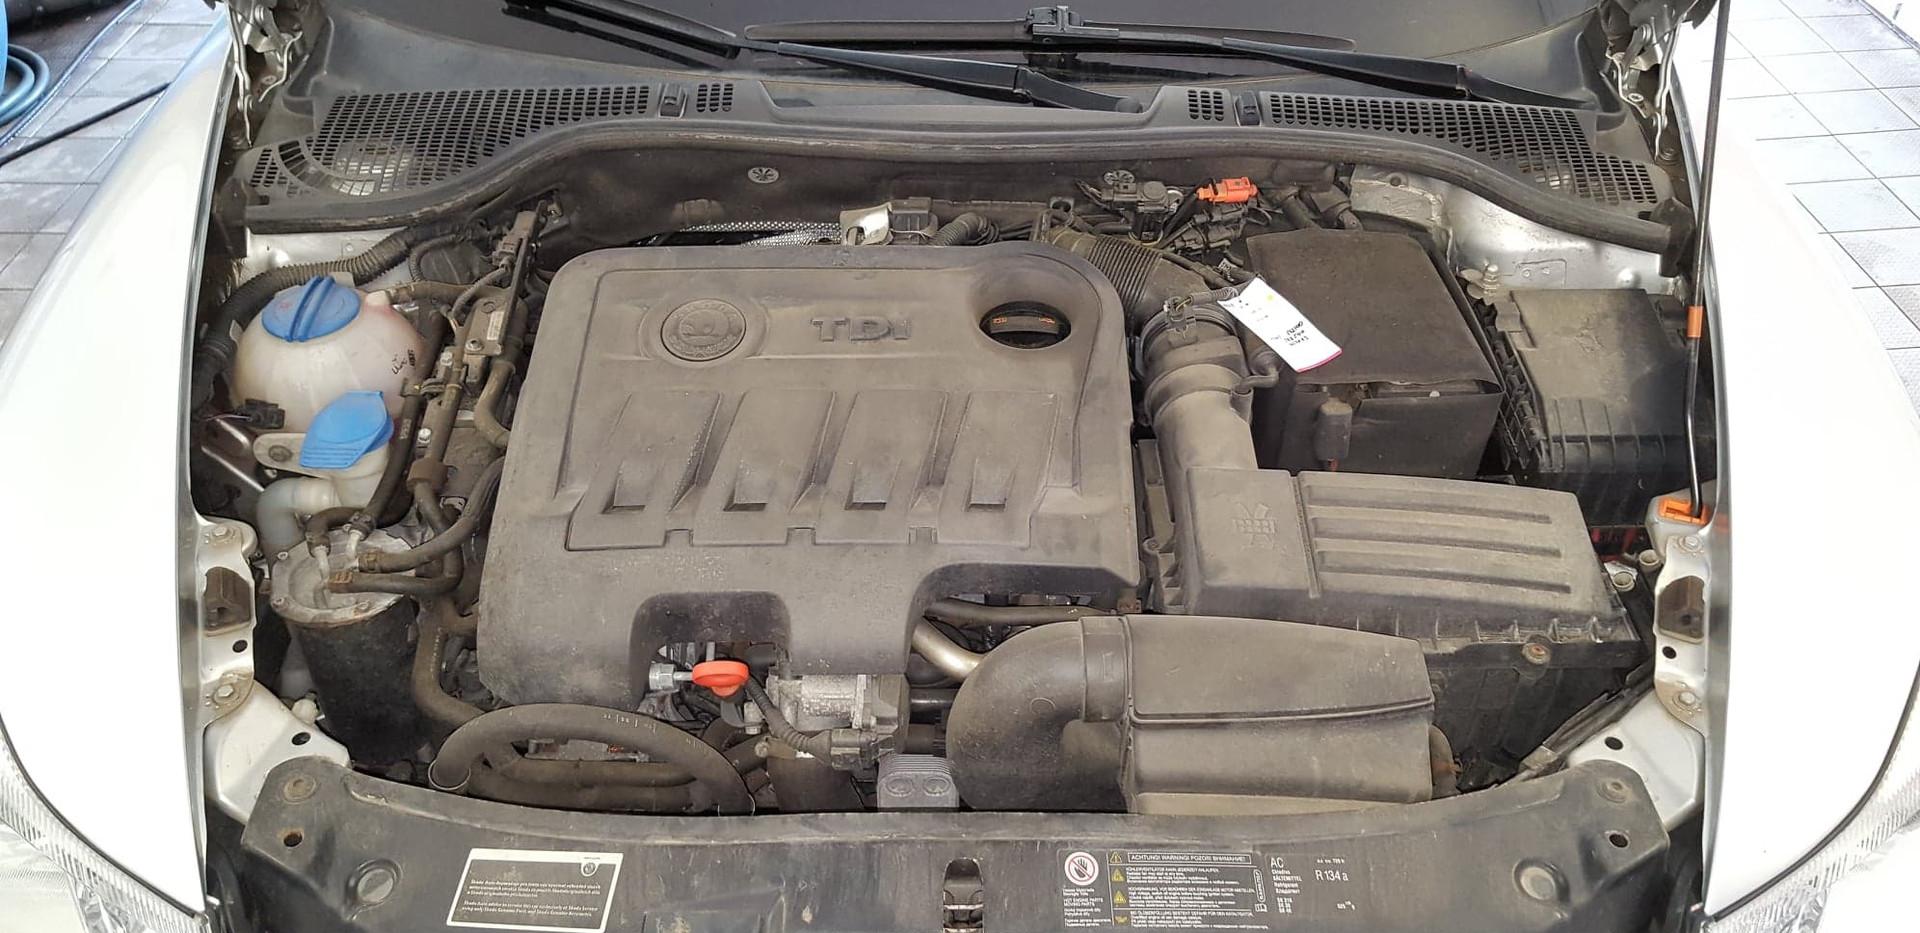 Car Wash - Cisteni motoru (8).jpg